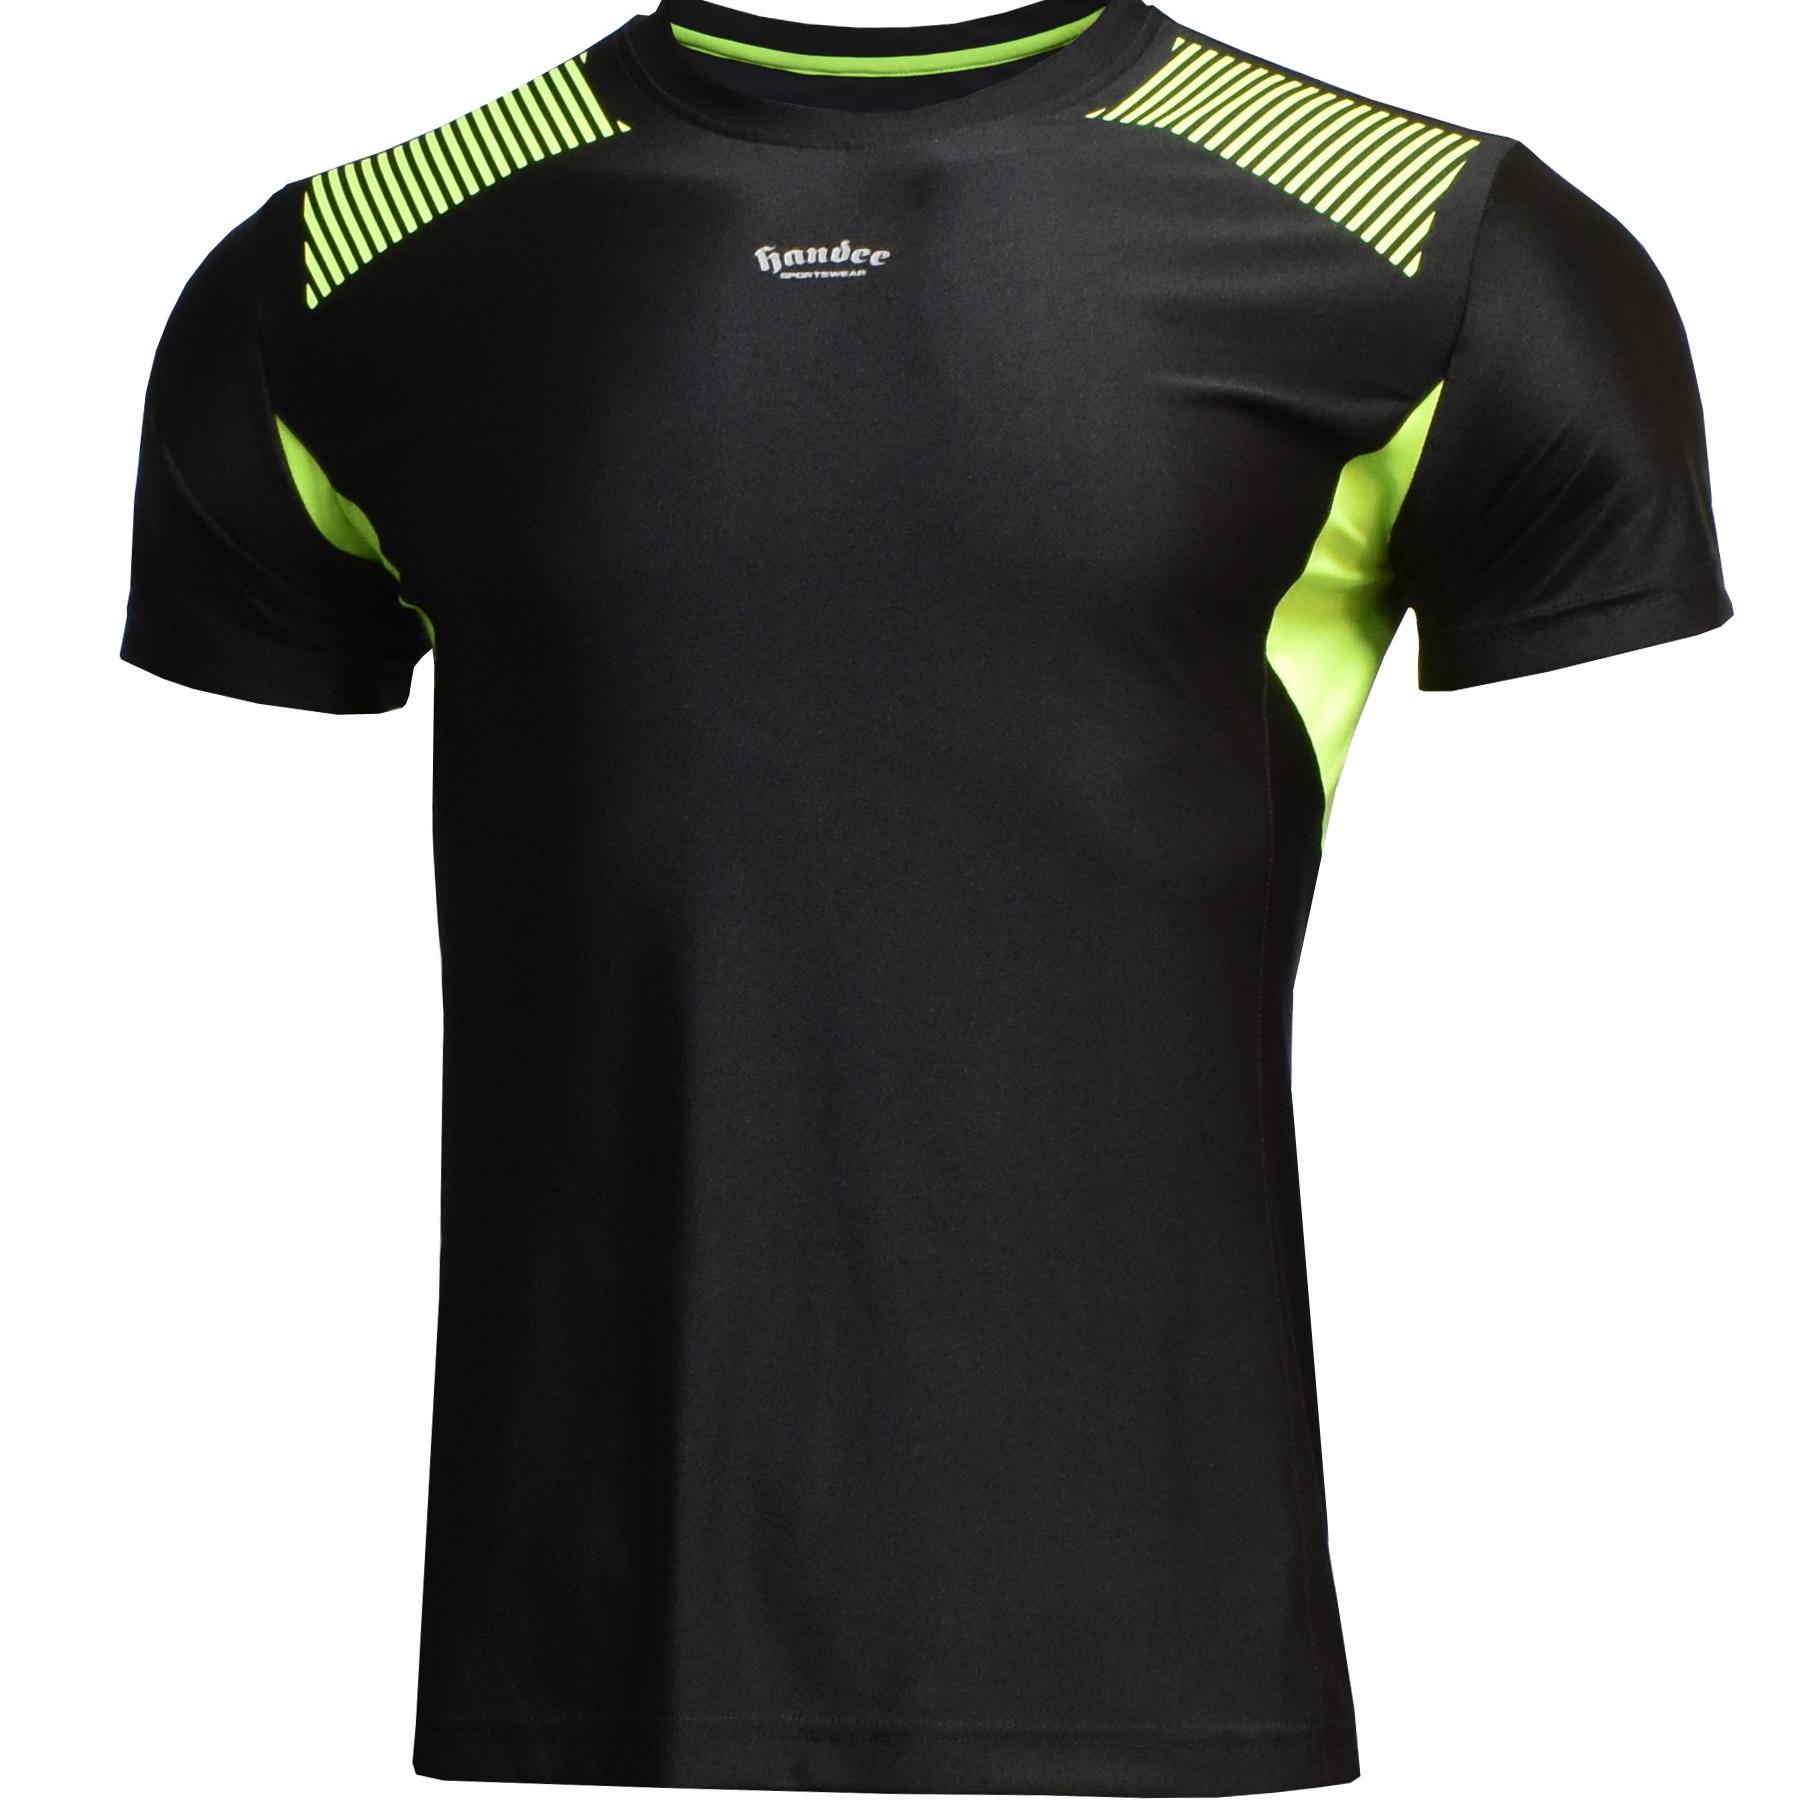 Top Quality Custom Sport Wear Fitness Sportswear Short Sleeve T-shirt Gym  Clothing Apparel For Men - Buy Gym Fitness Clothing For Men,Gym